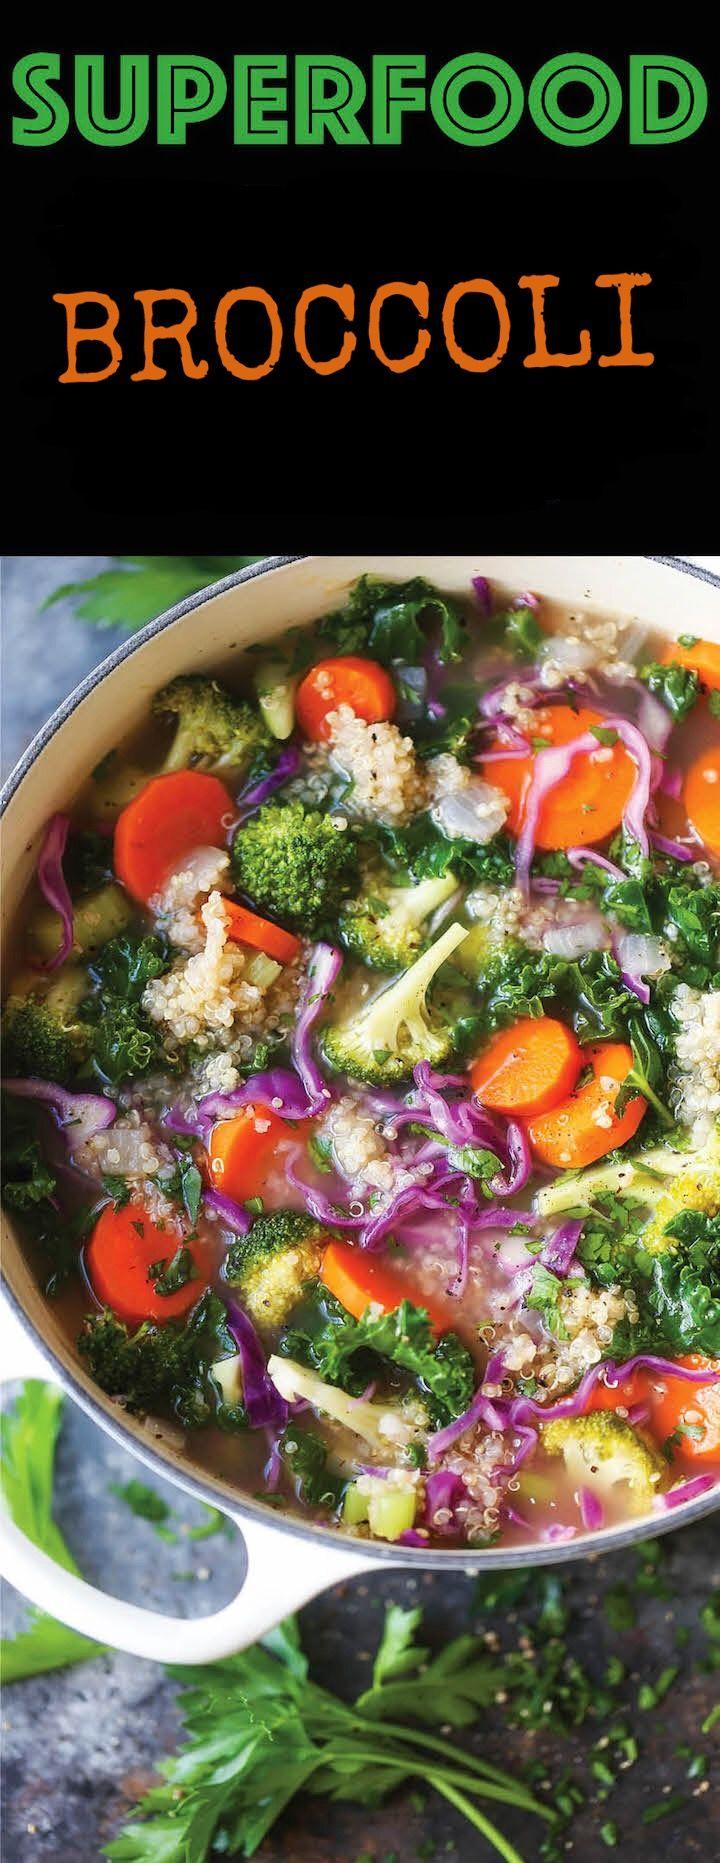 ▼Broccoli: Health Benefits, Nutritional Superfood Information